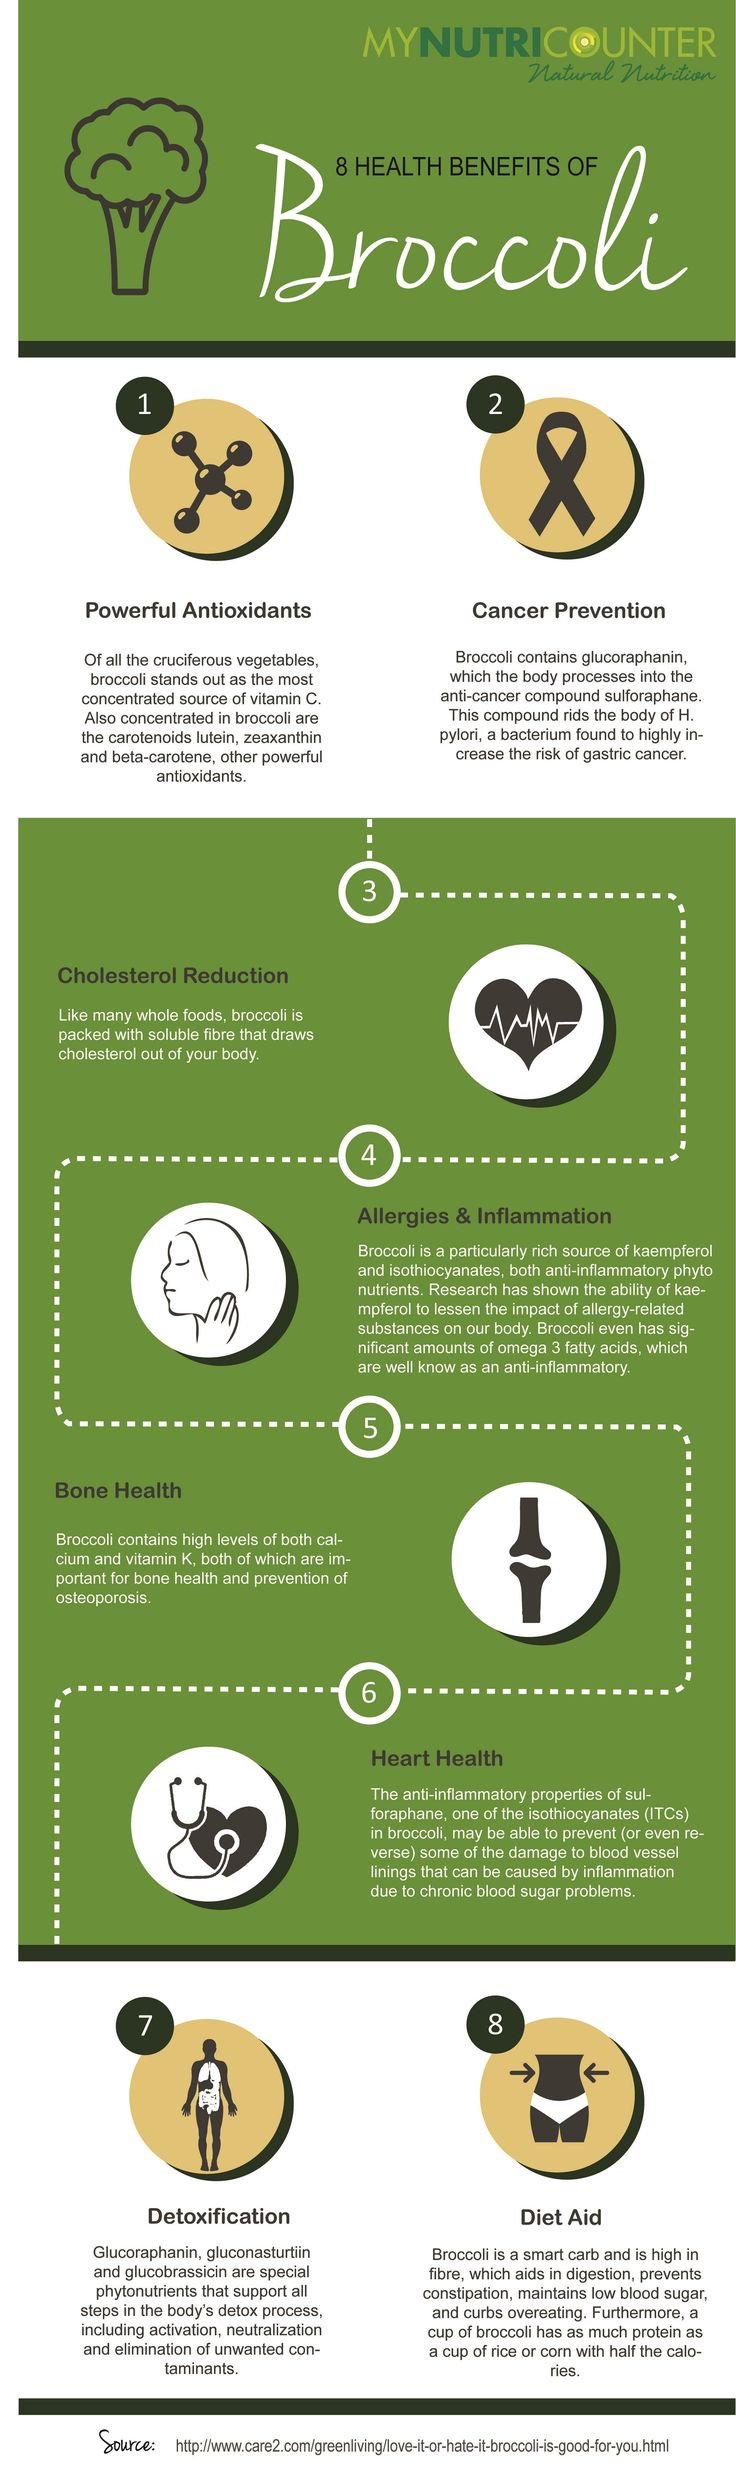 MyNutriCounter_Broccoli_Benefits by MyNutriCounter